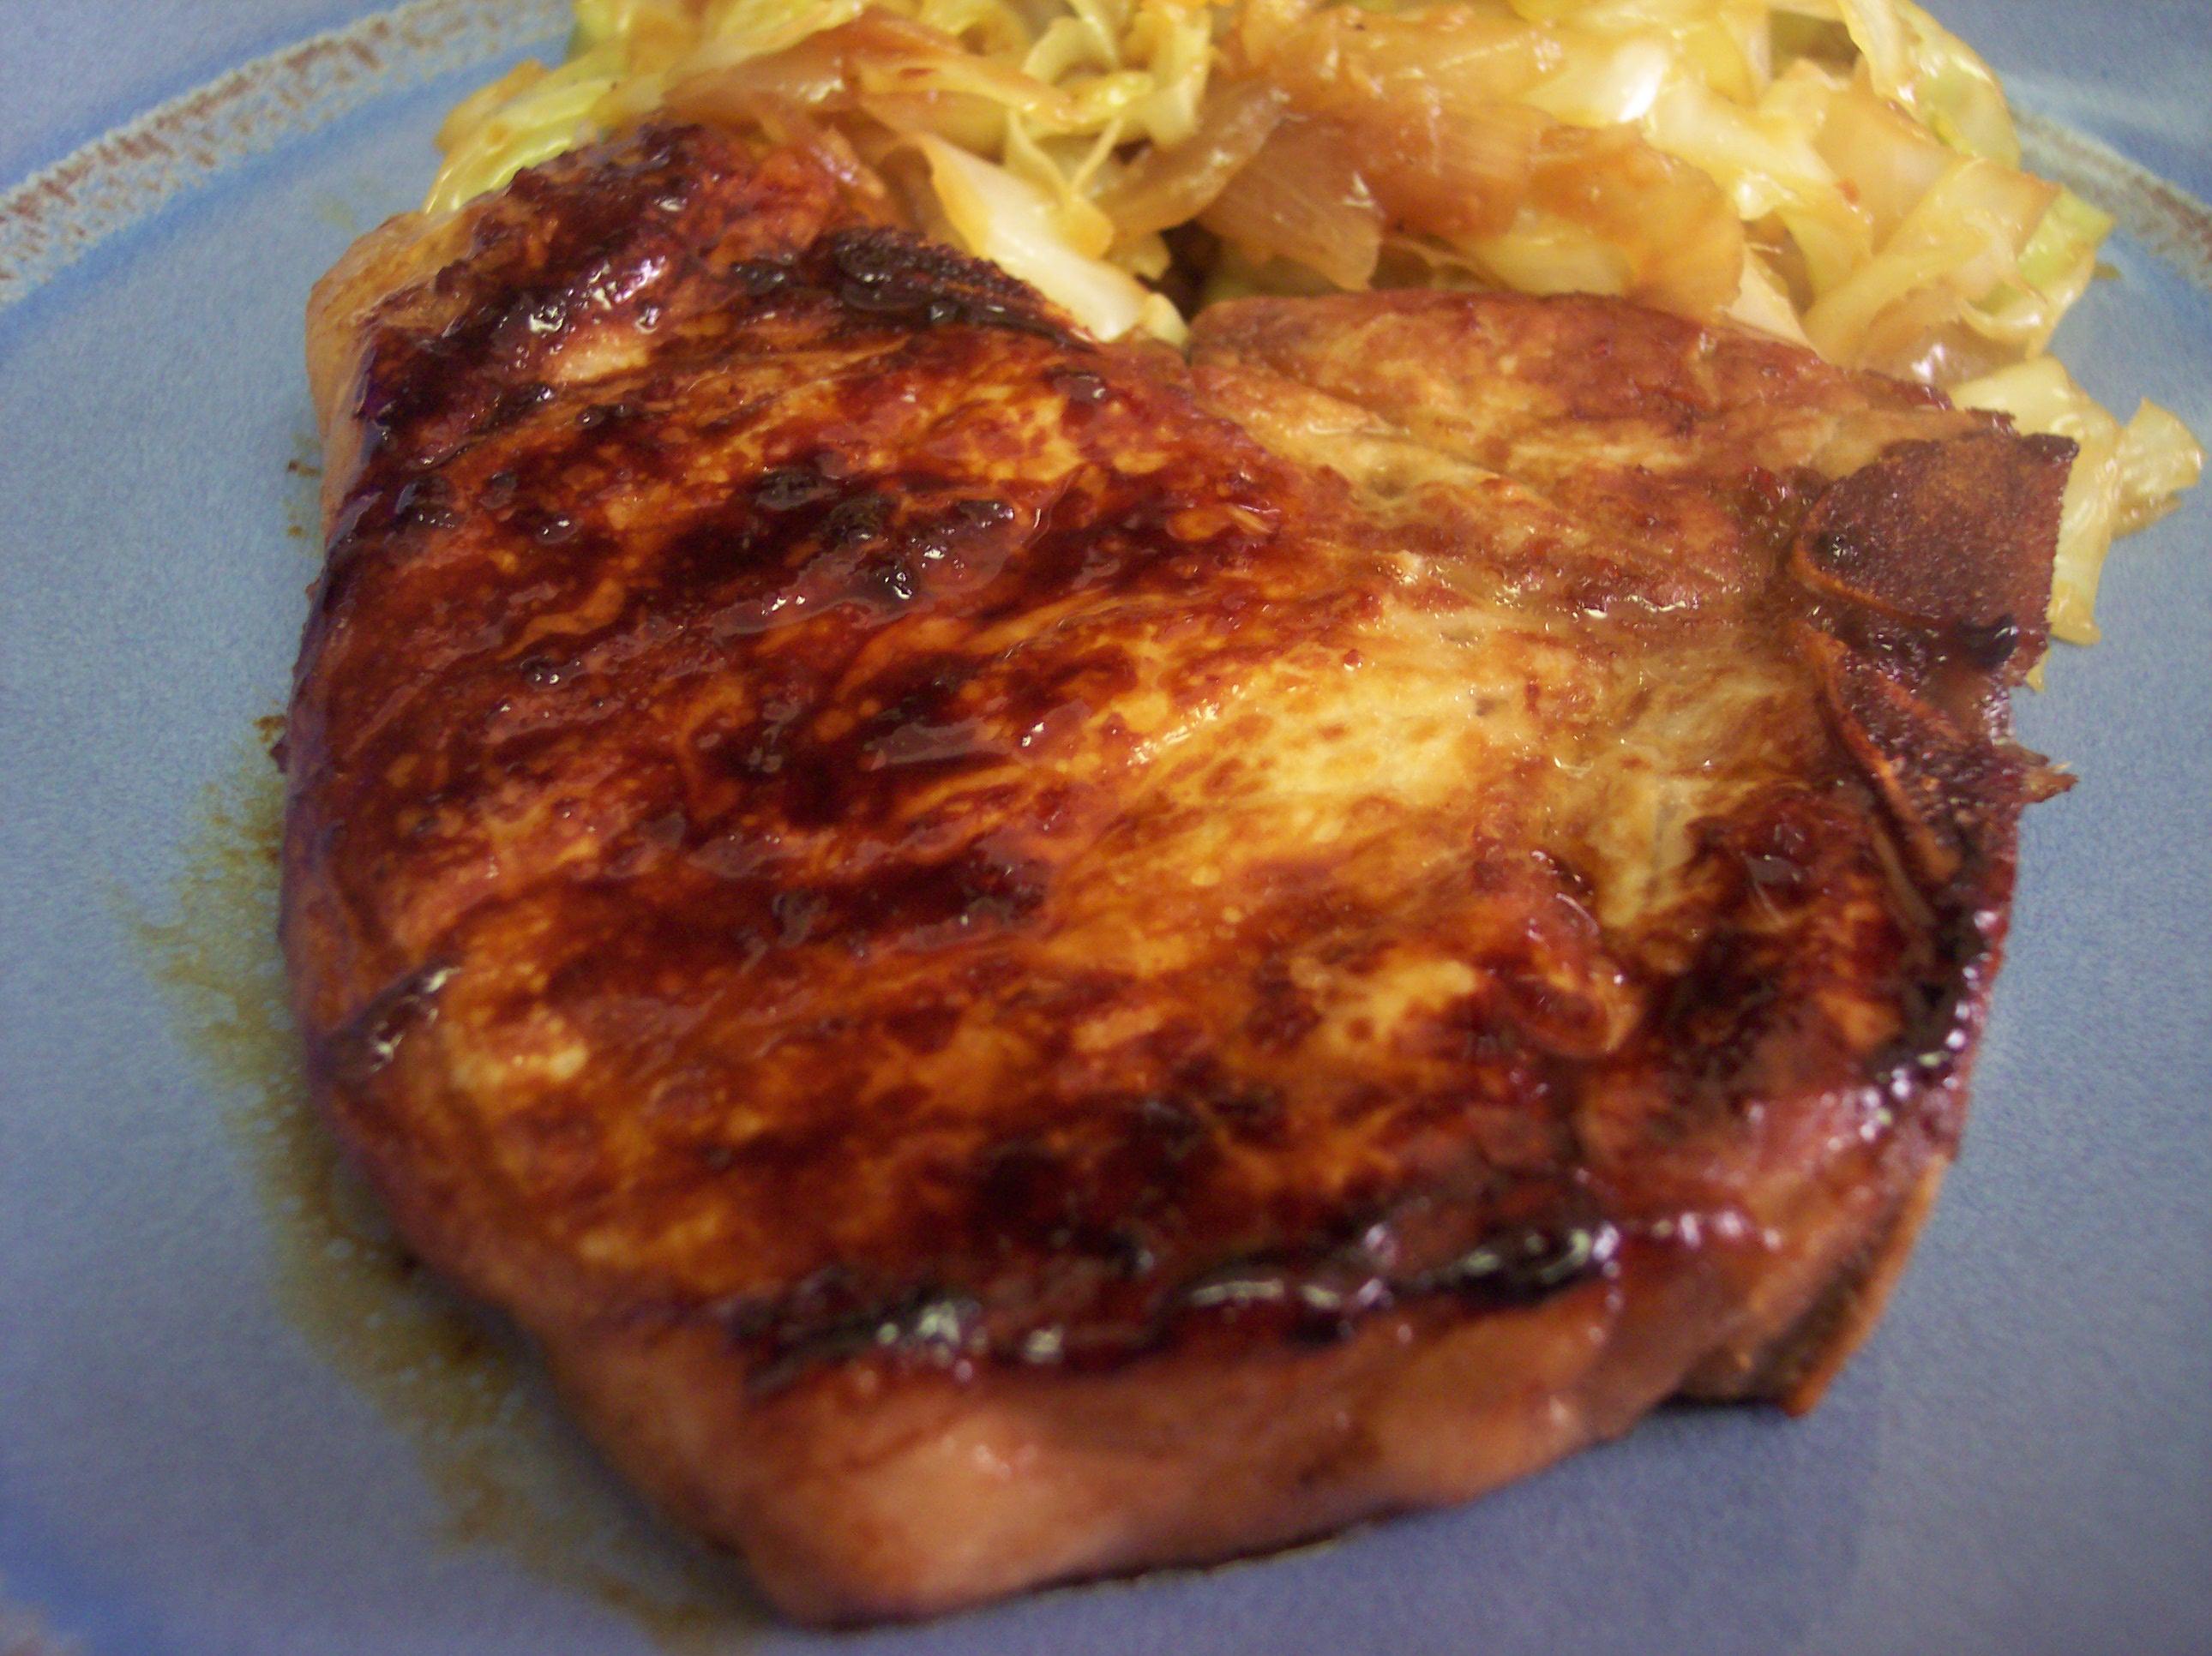 Easy grilling recipes for pork chops